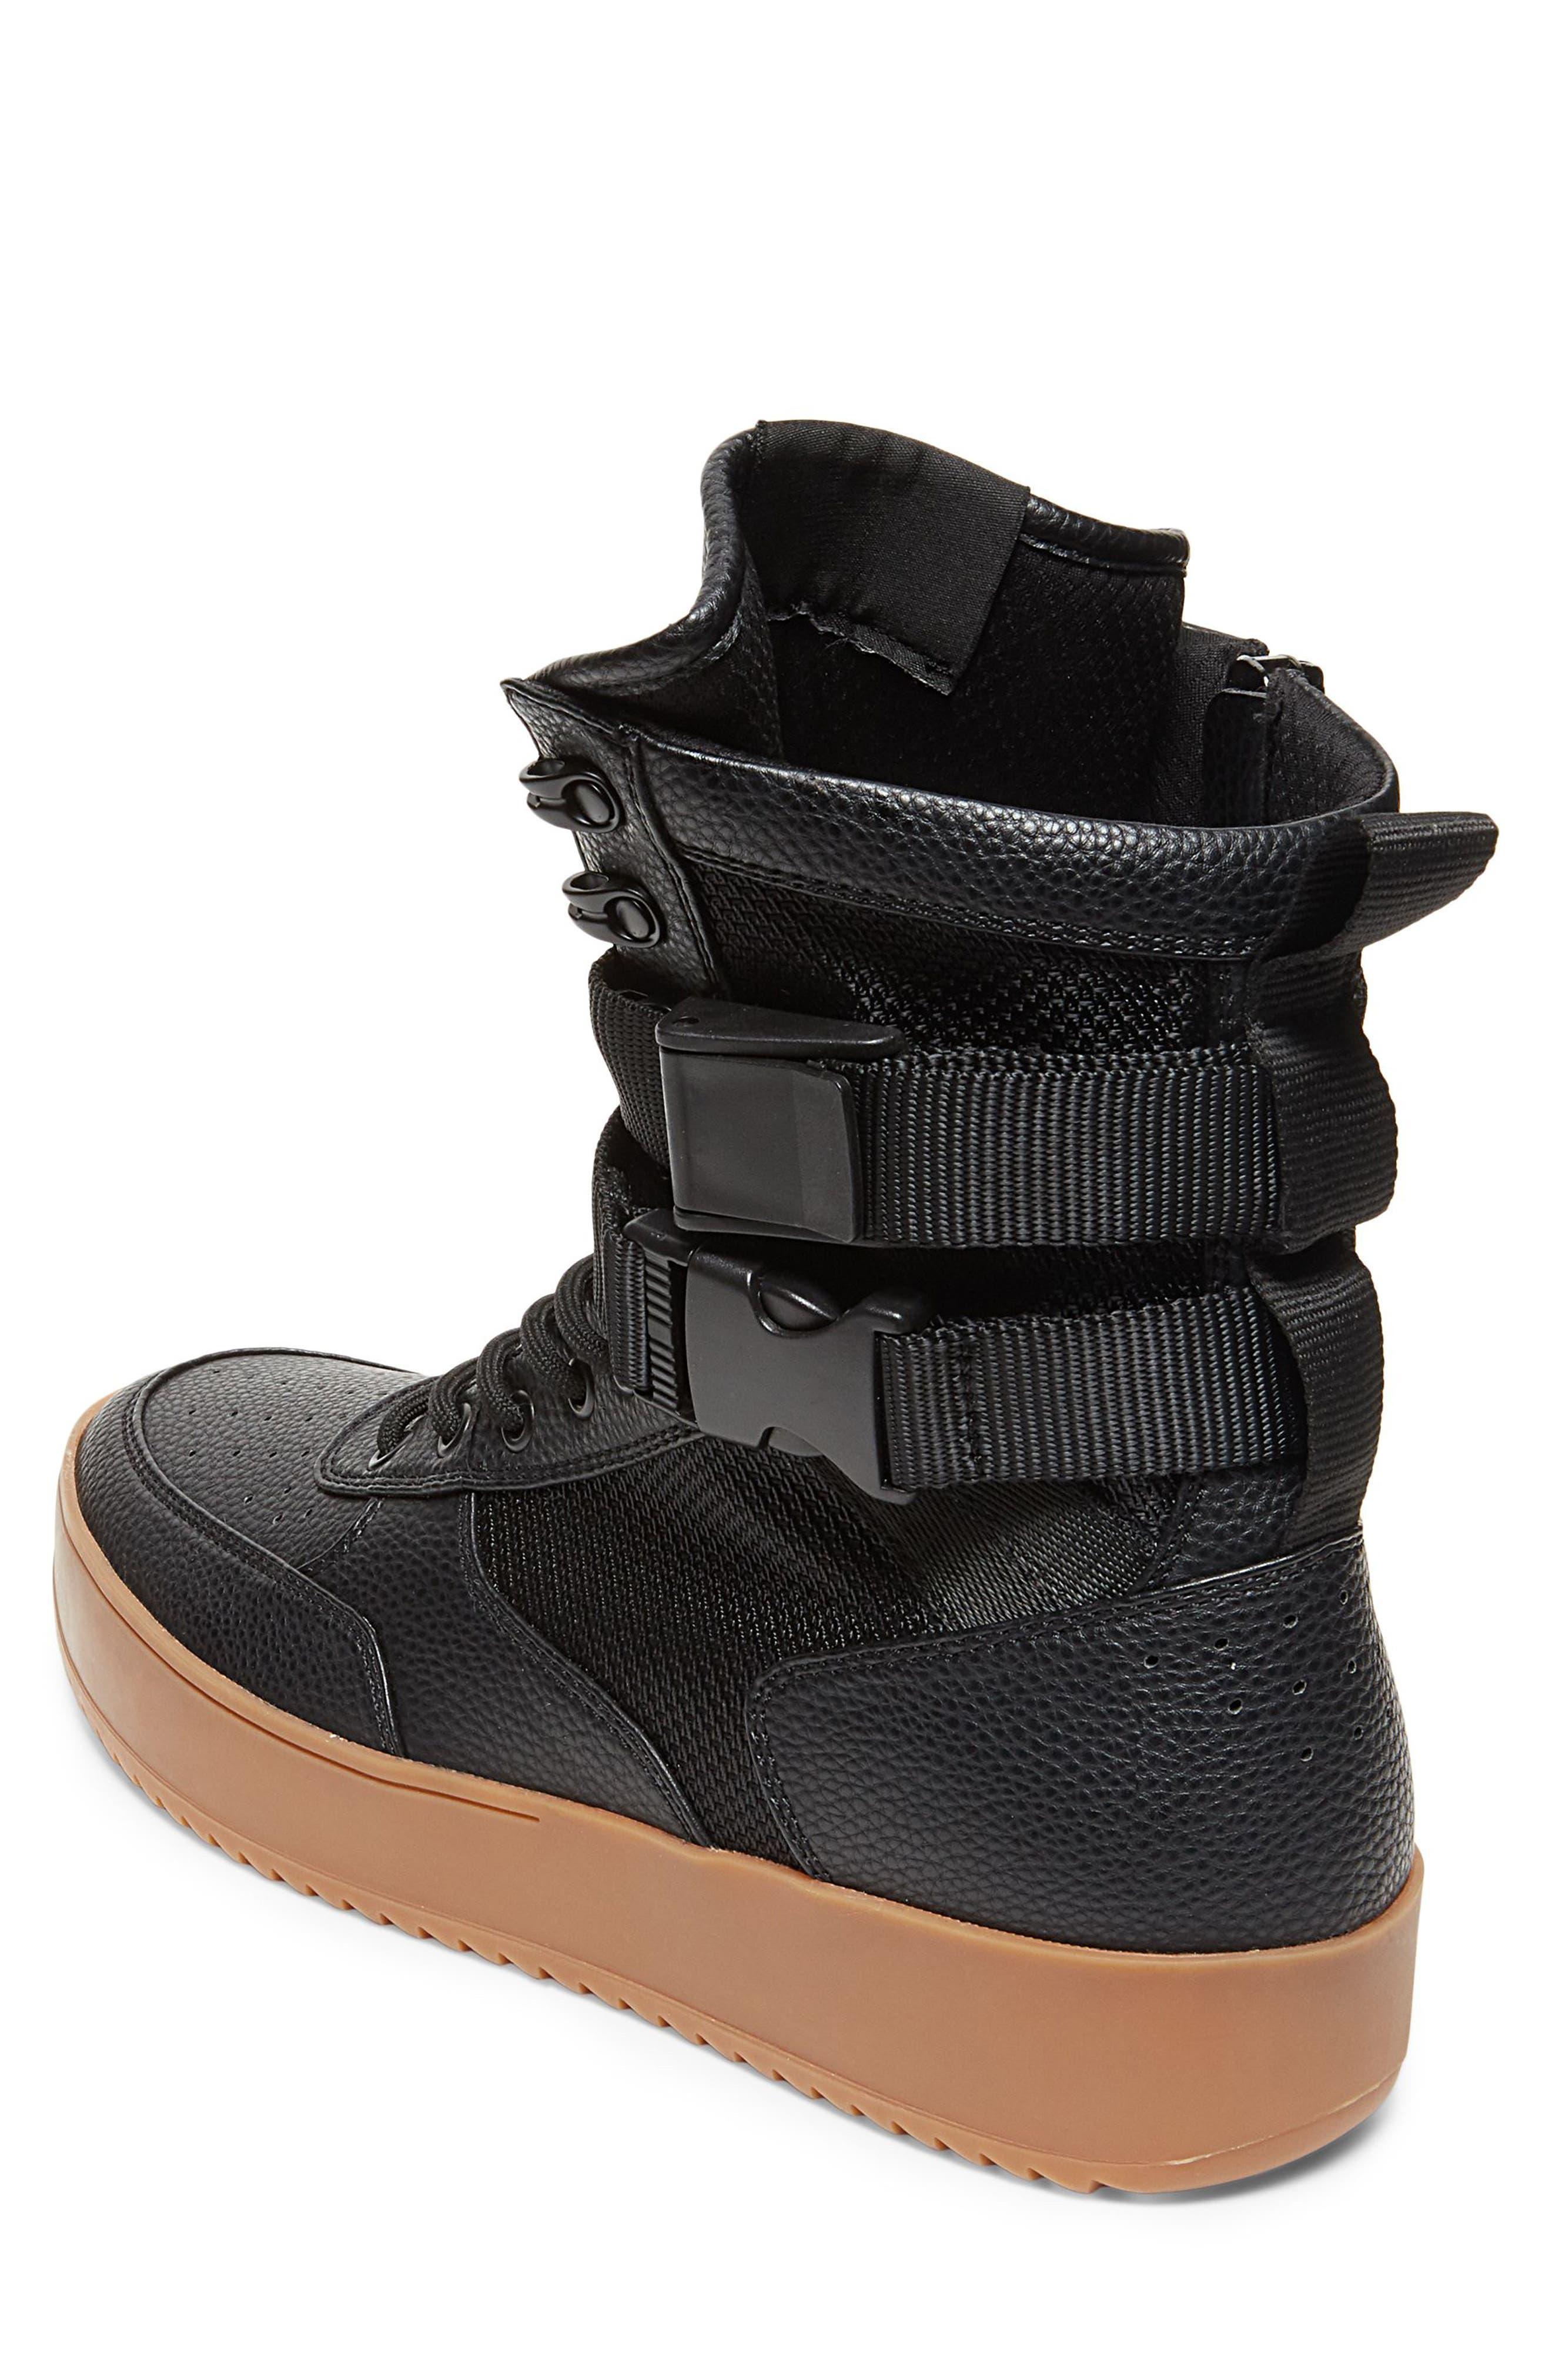 Zeroday Sneaker,                             Alternate thumbnail 2, color,                             Black